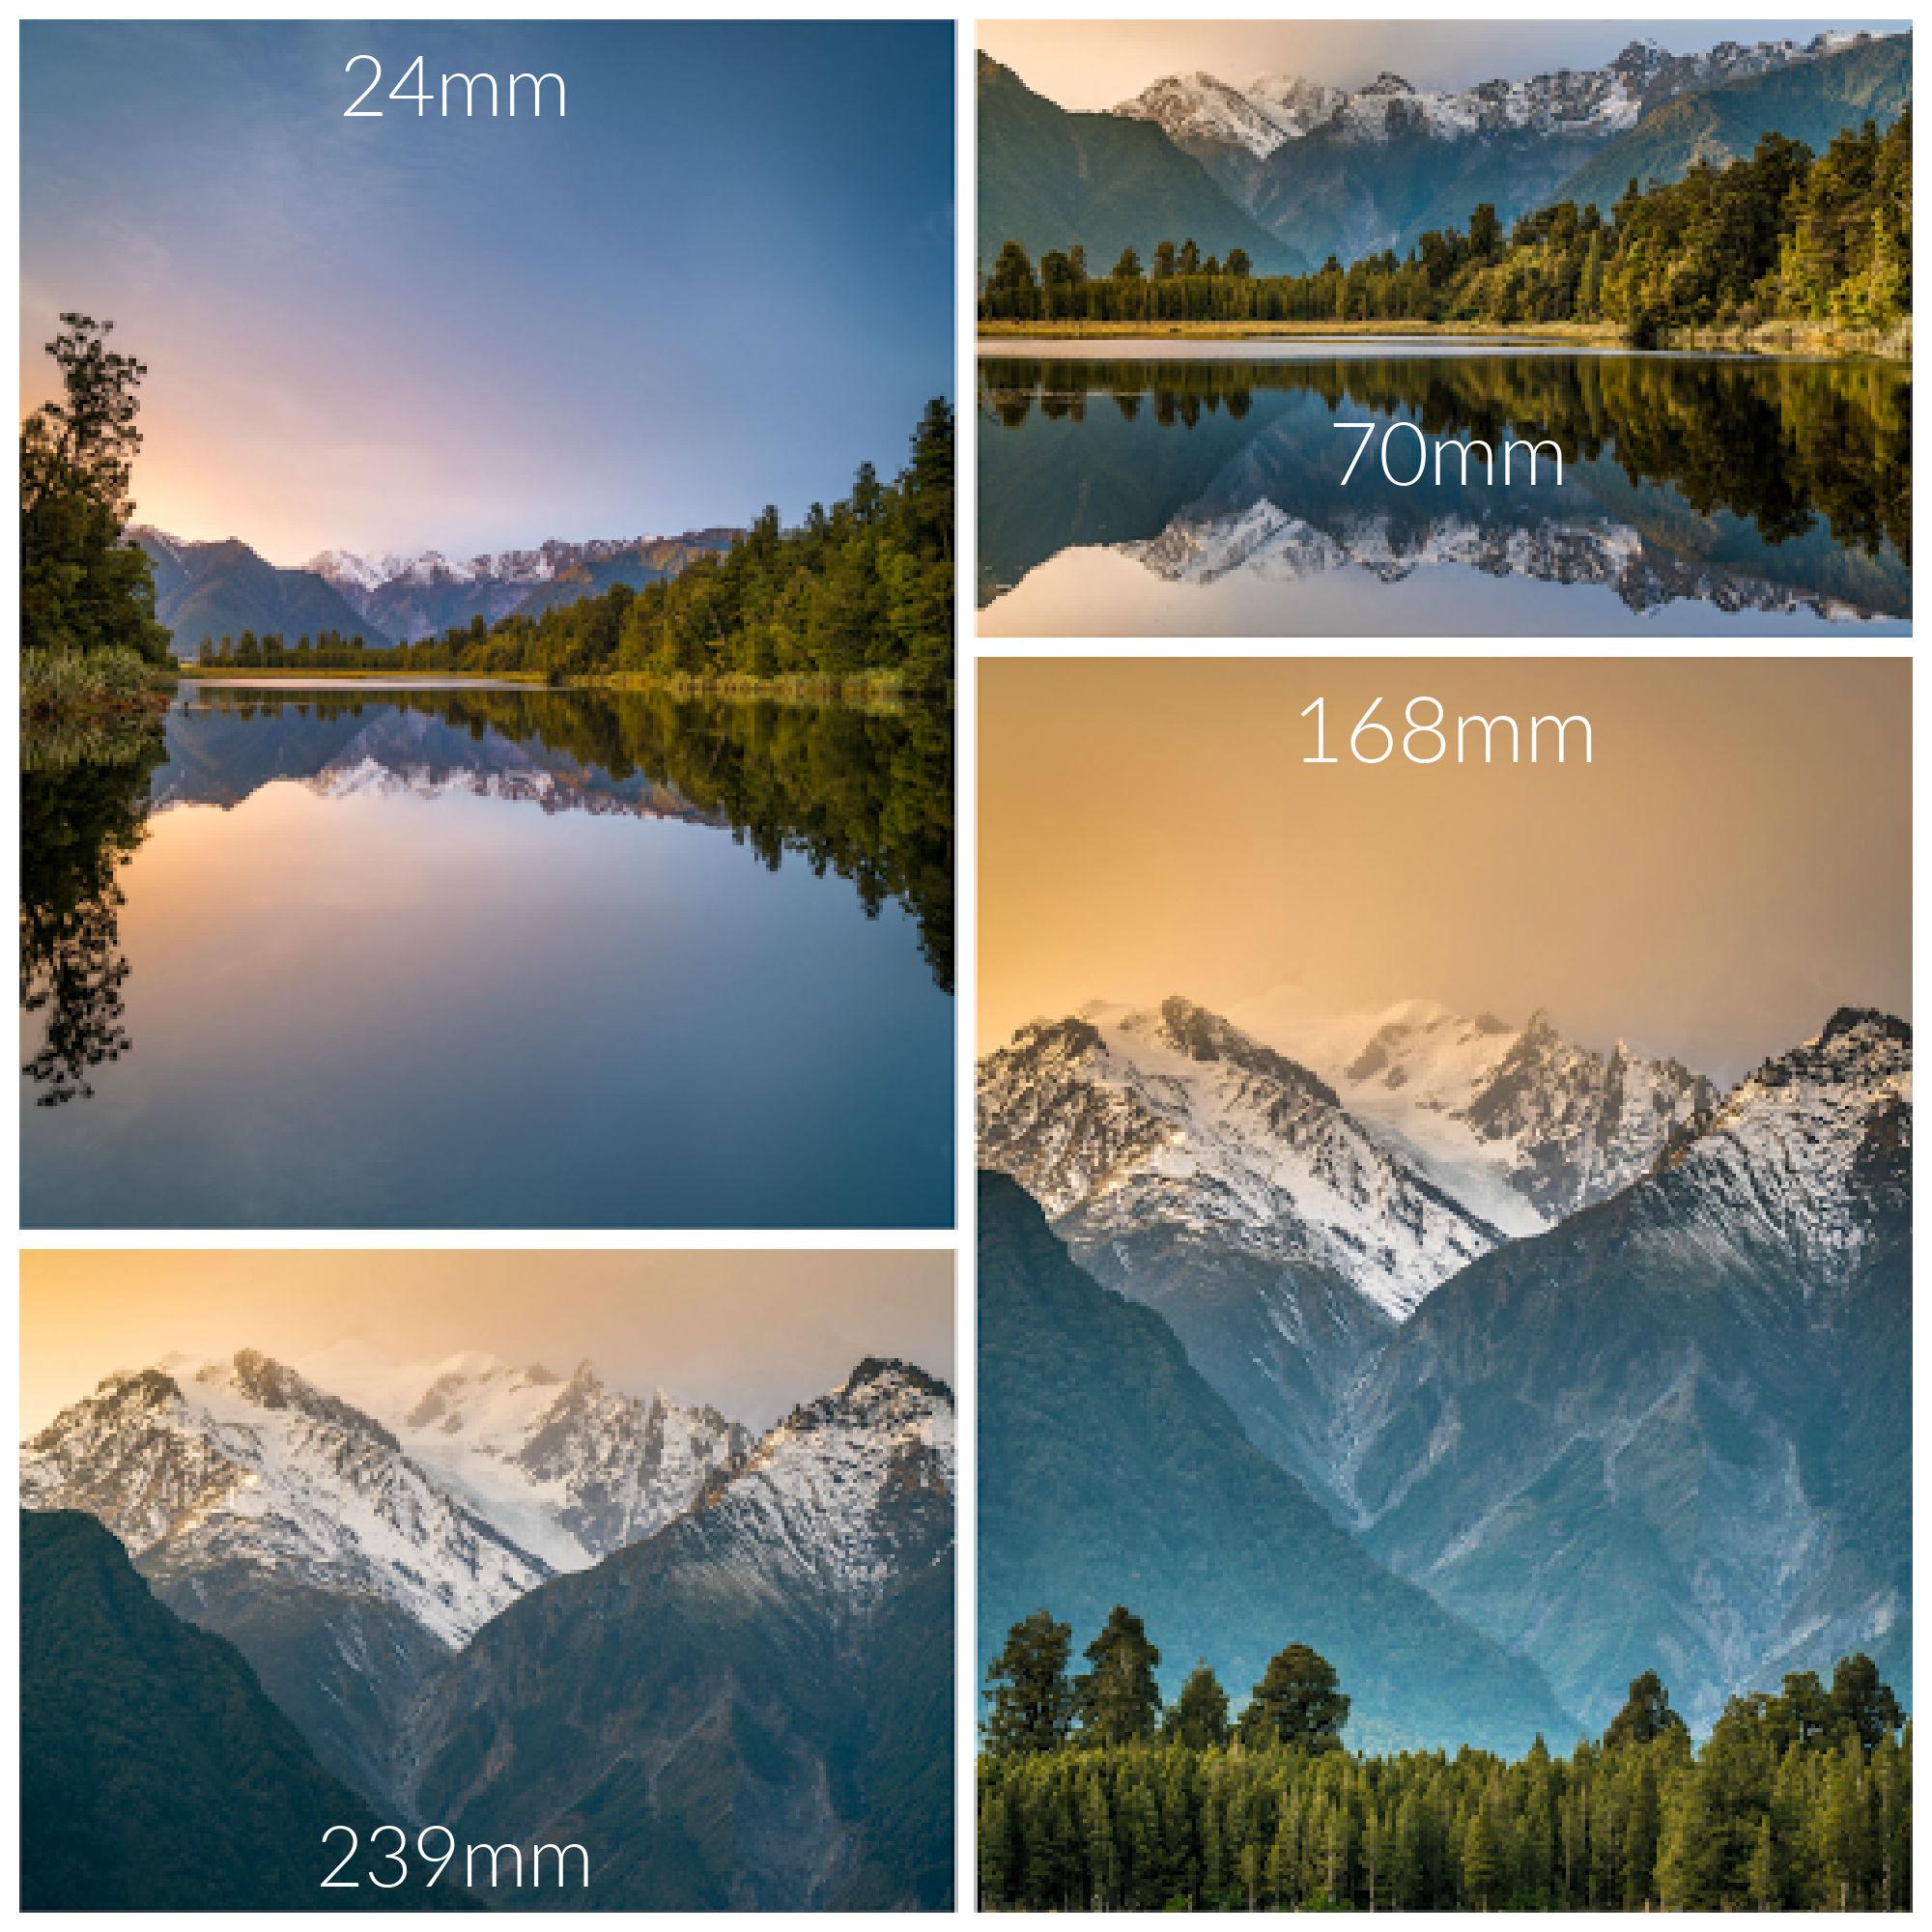 Lake Matheson focal lengths